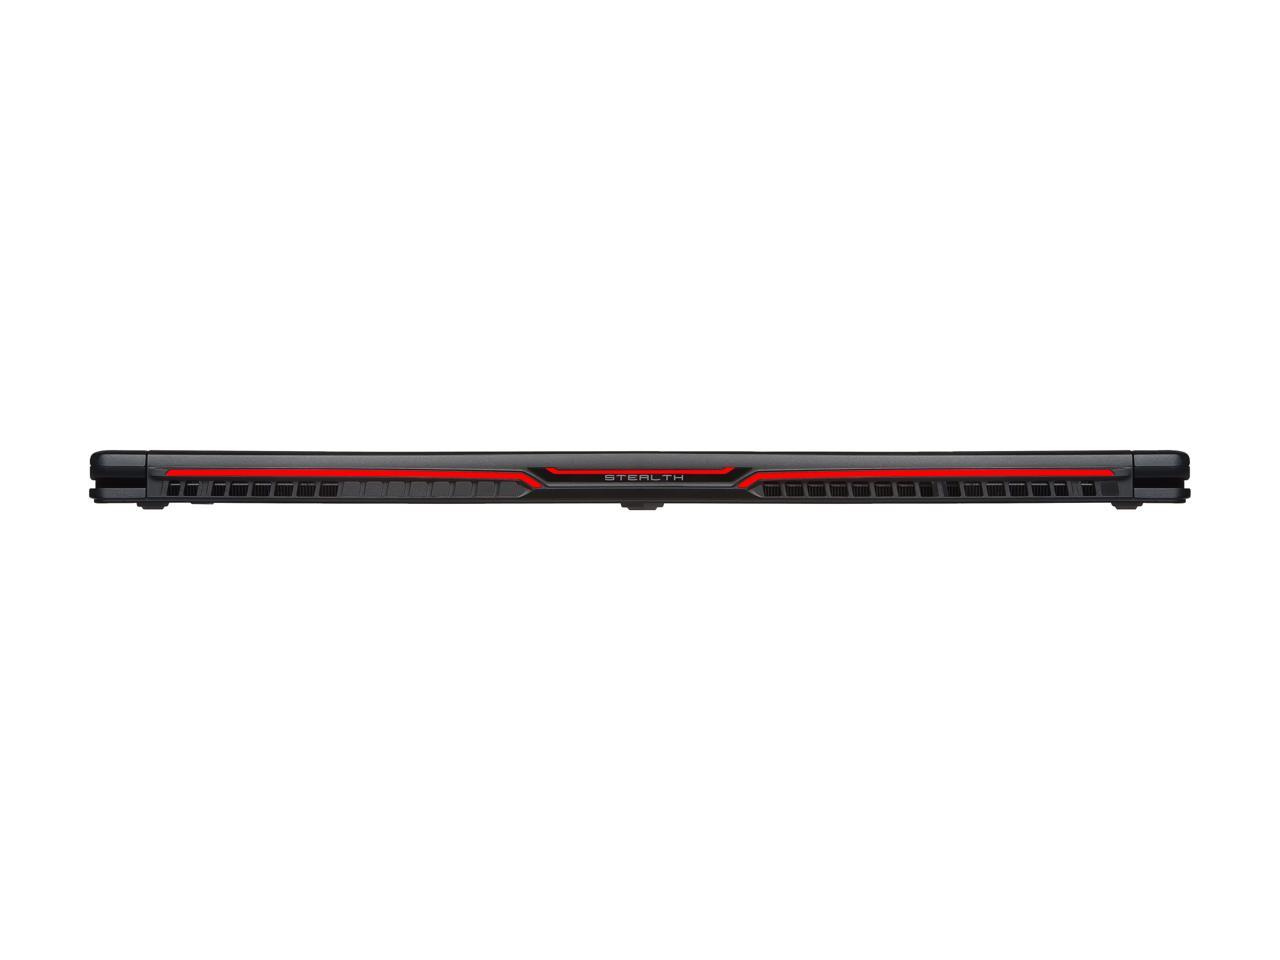 "MSI GS63VR Stealth Pro (7th Gen) 15.6"" VGA GEFORCE® GTX 1060 | GTX 1070 | GTX 1080"